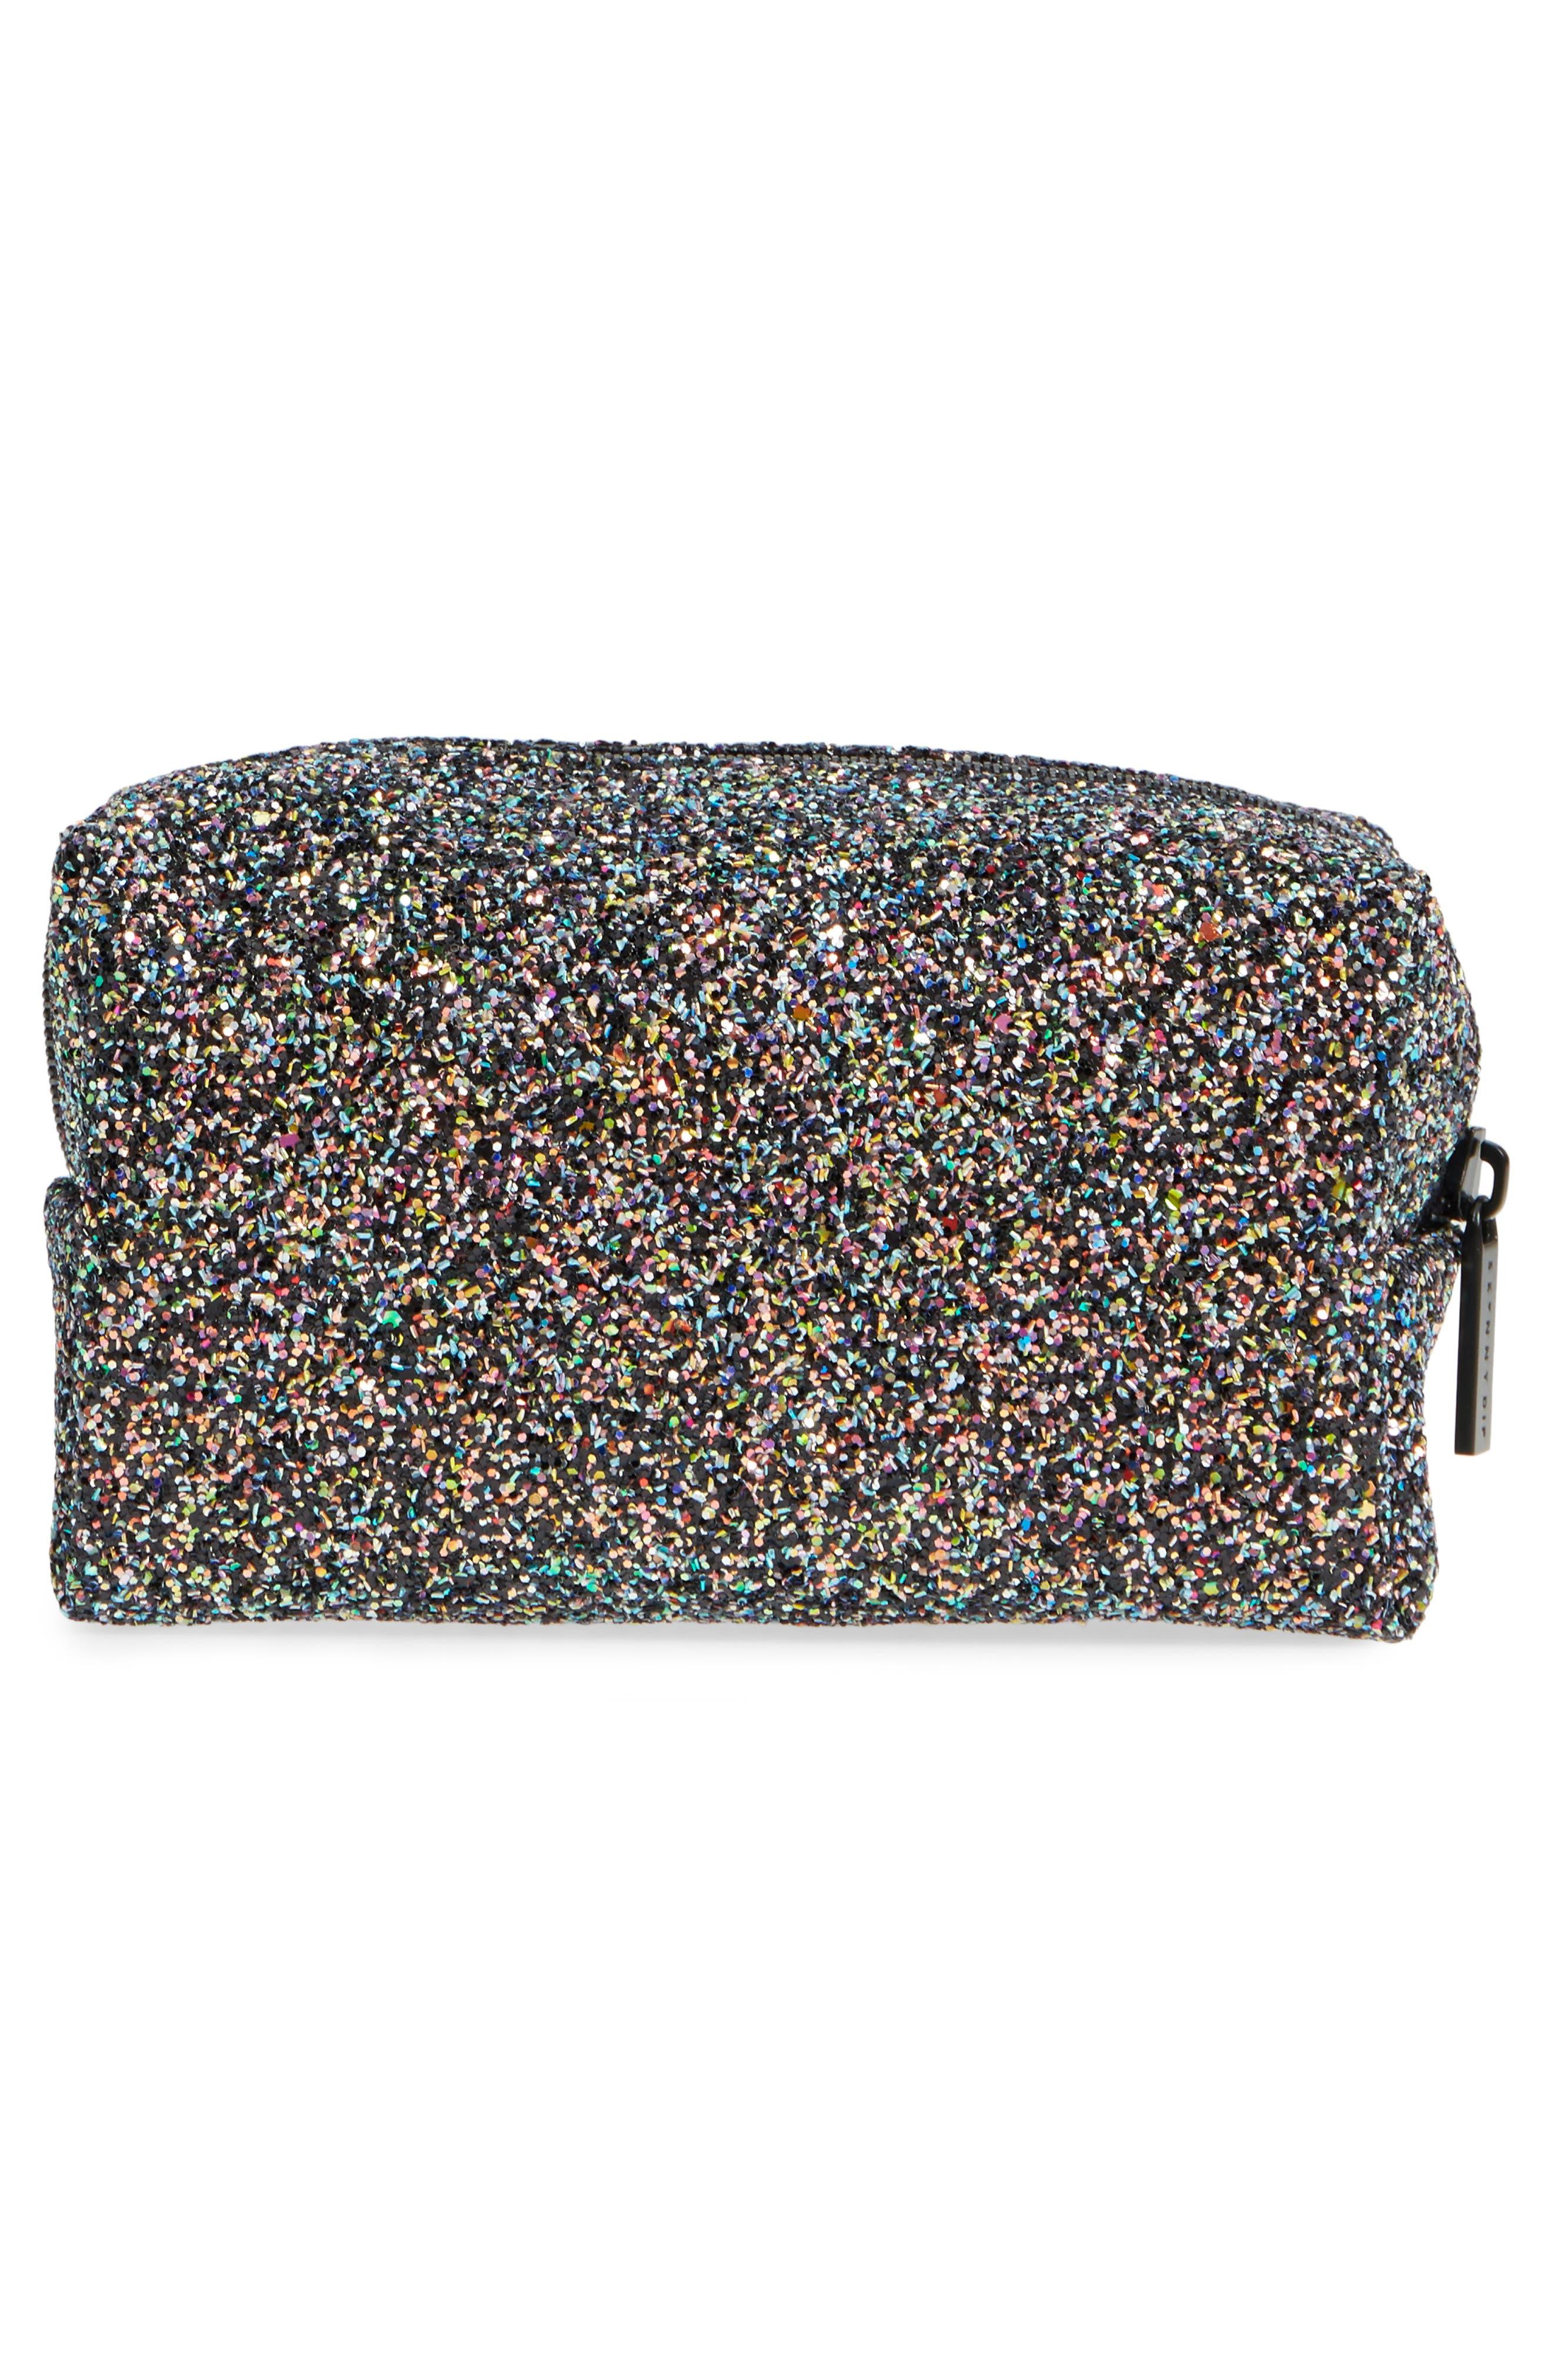 Skinny Dip Liquorice Glitter Cosmetics Bag,                             Alternate thumbnail 2, color,                             No Color